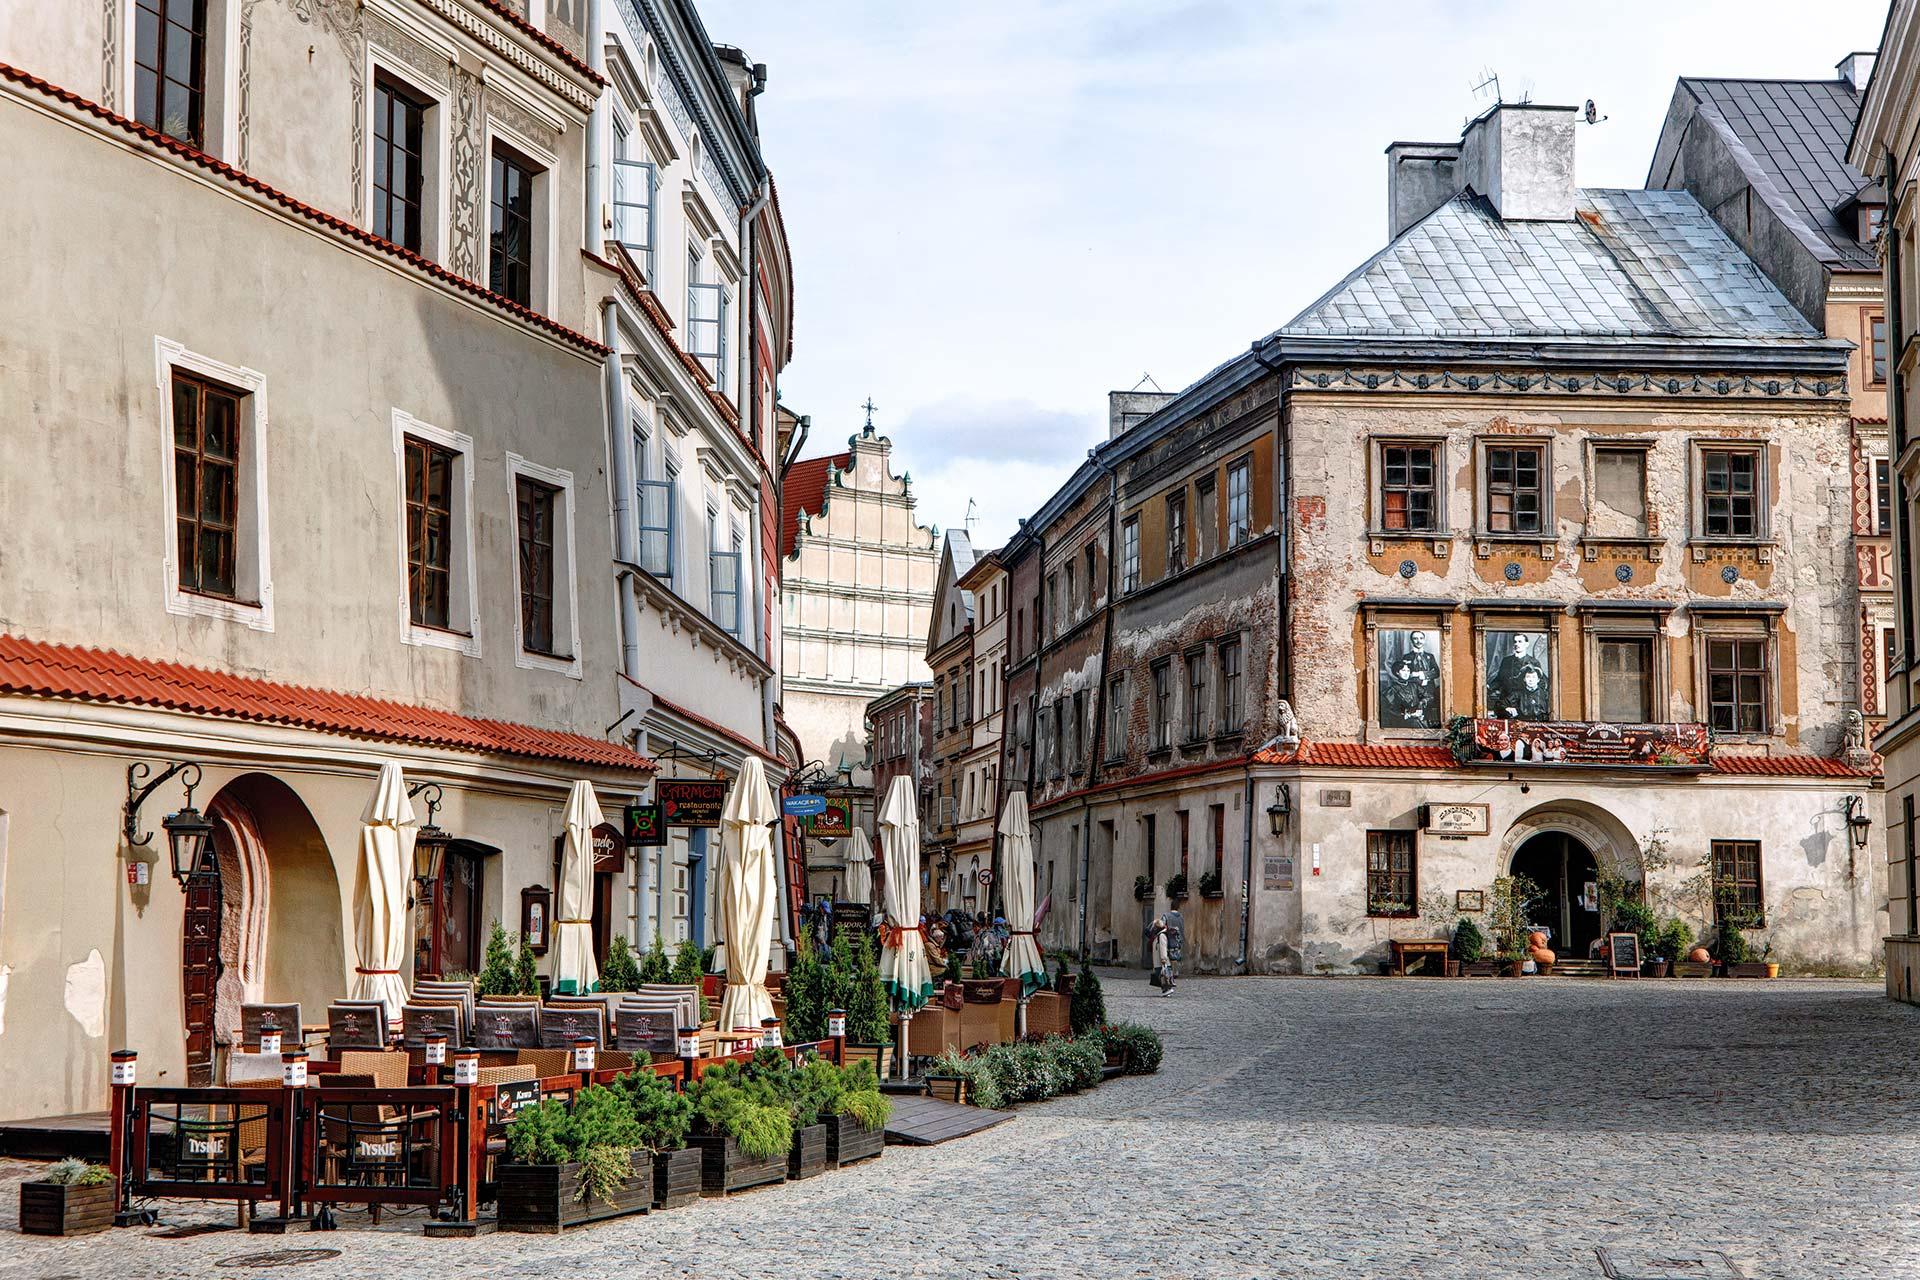 Kamienice Starego Miasta za dnia